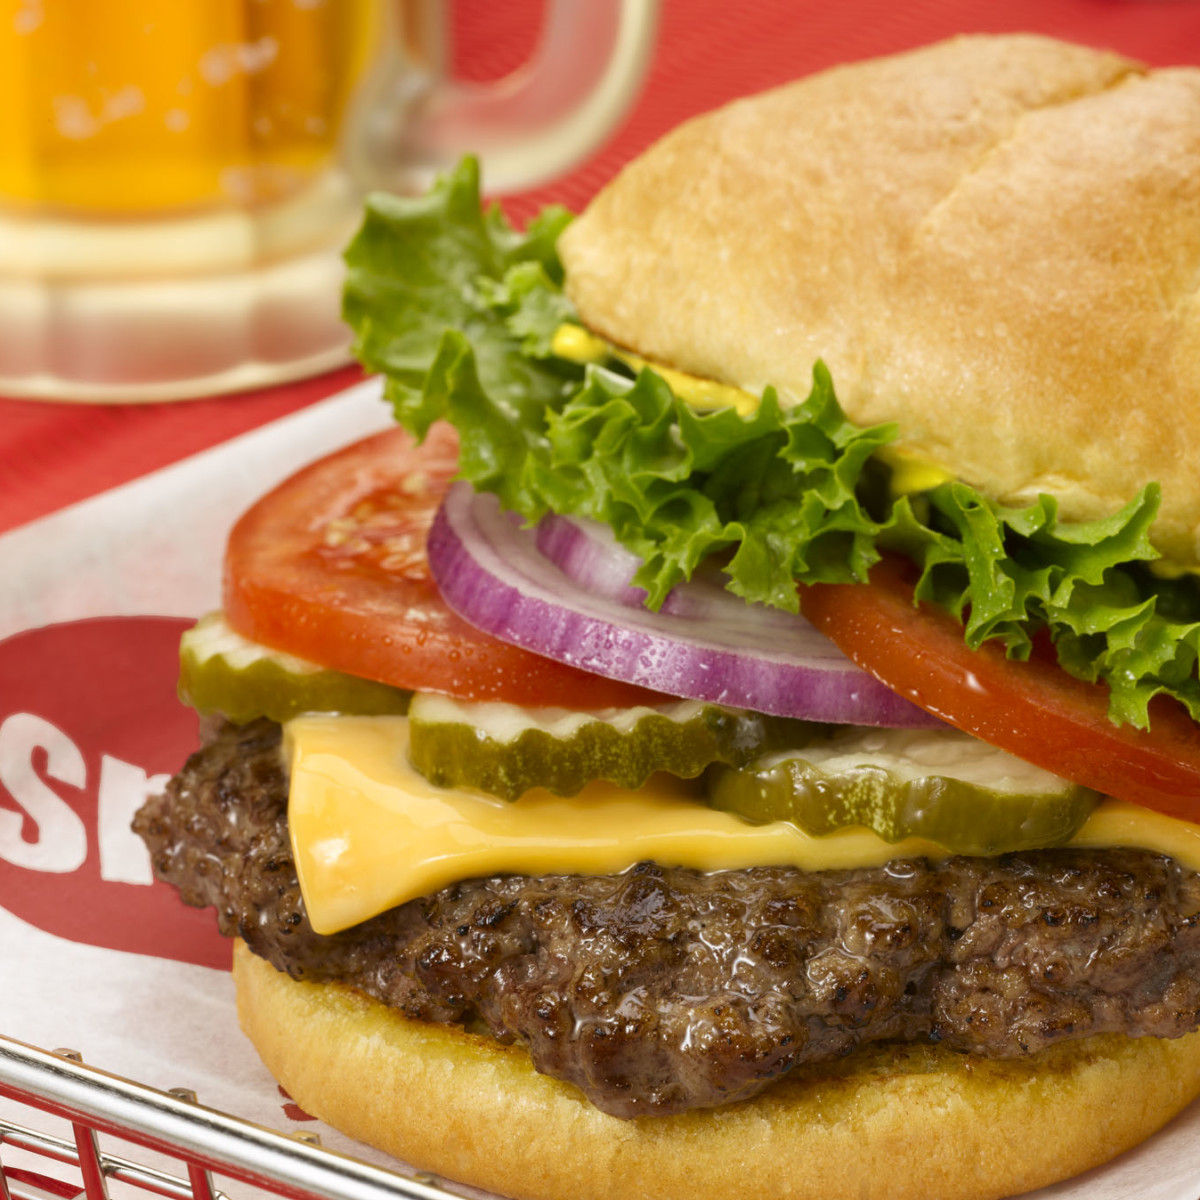 Smashburger hamburger